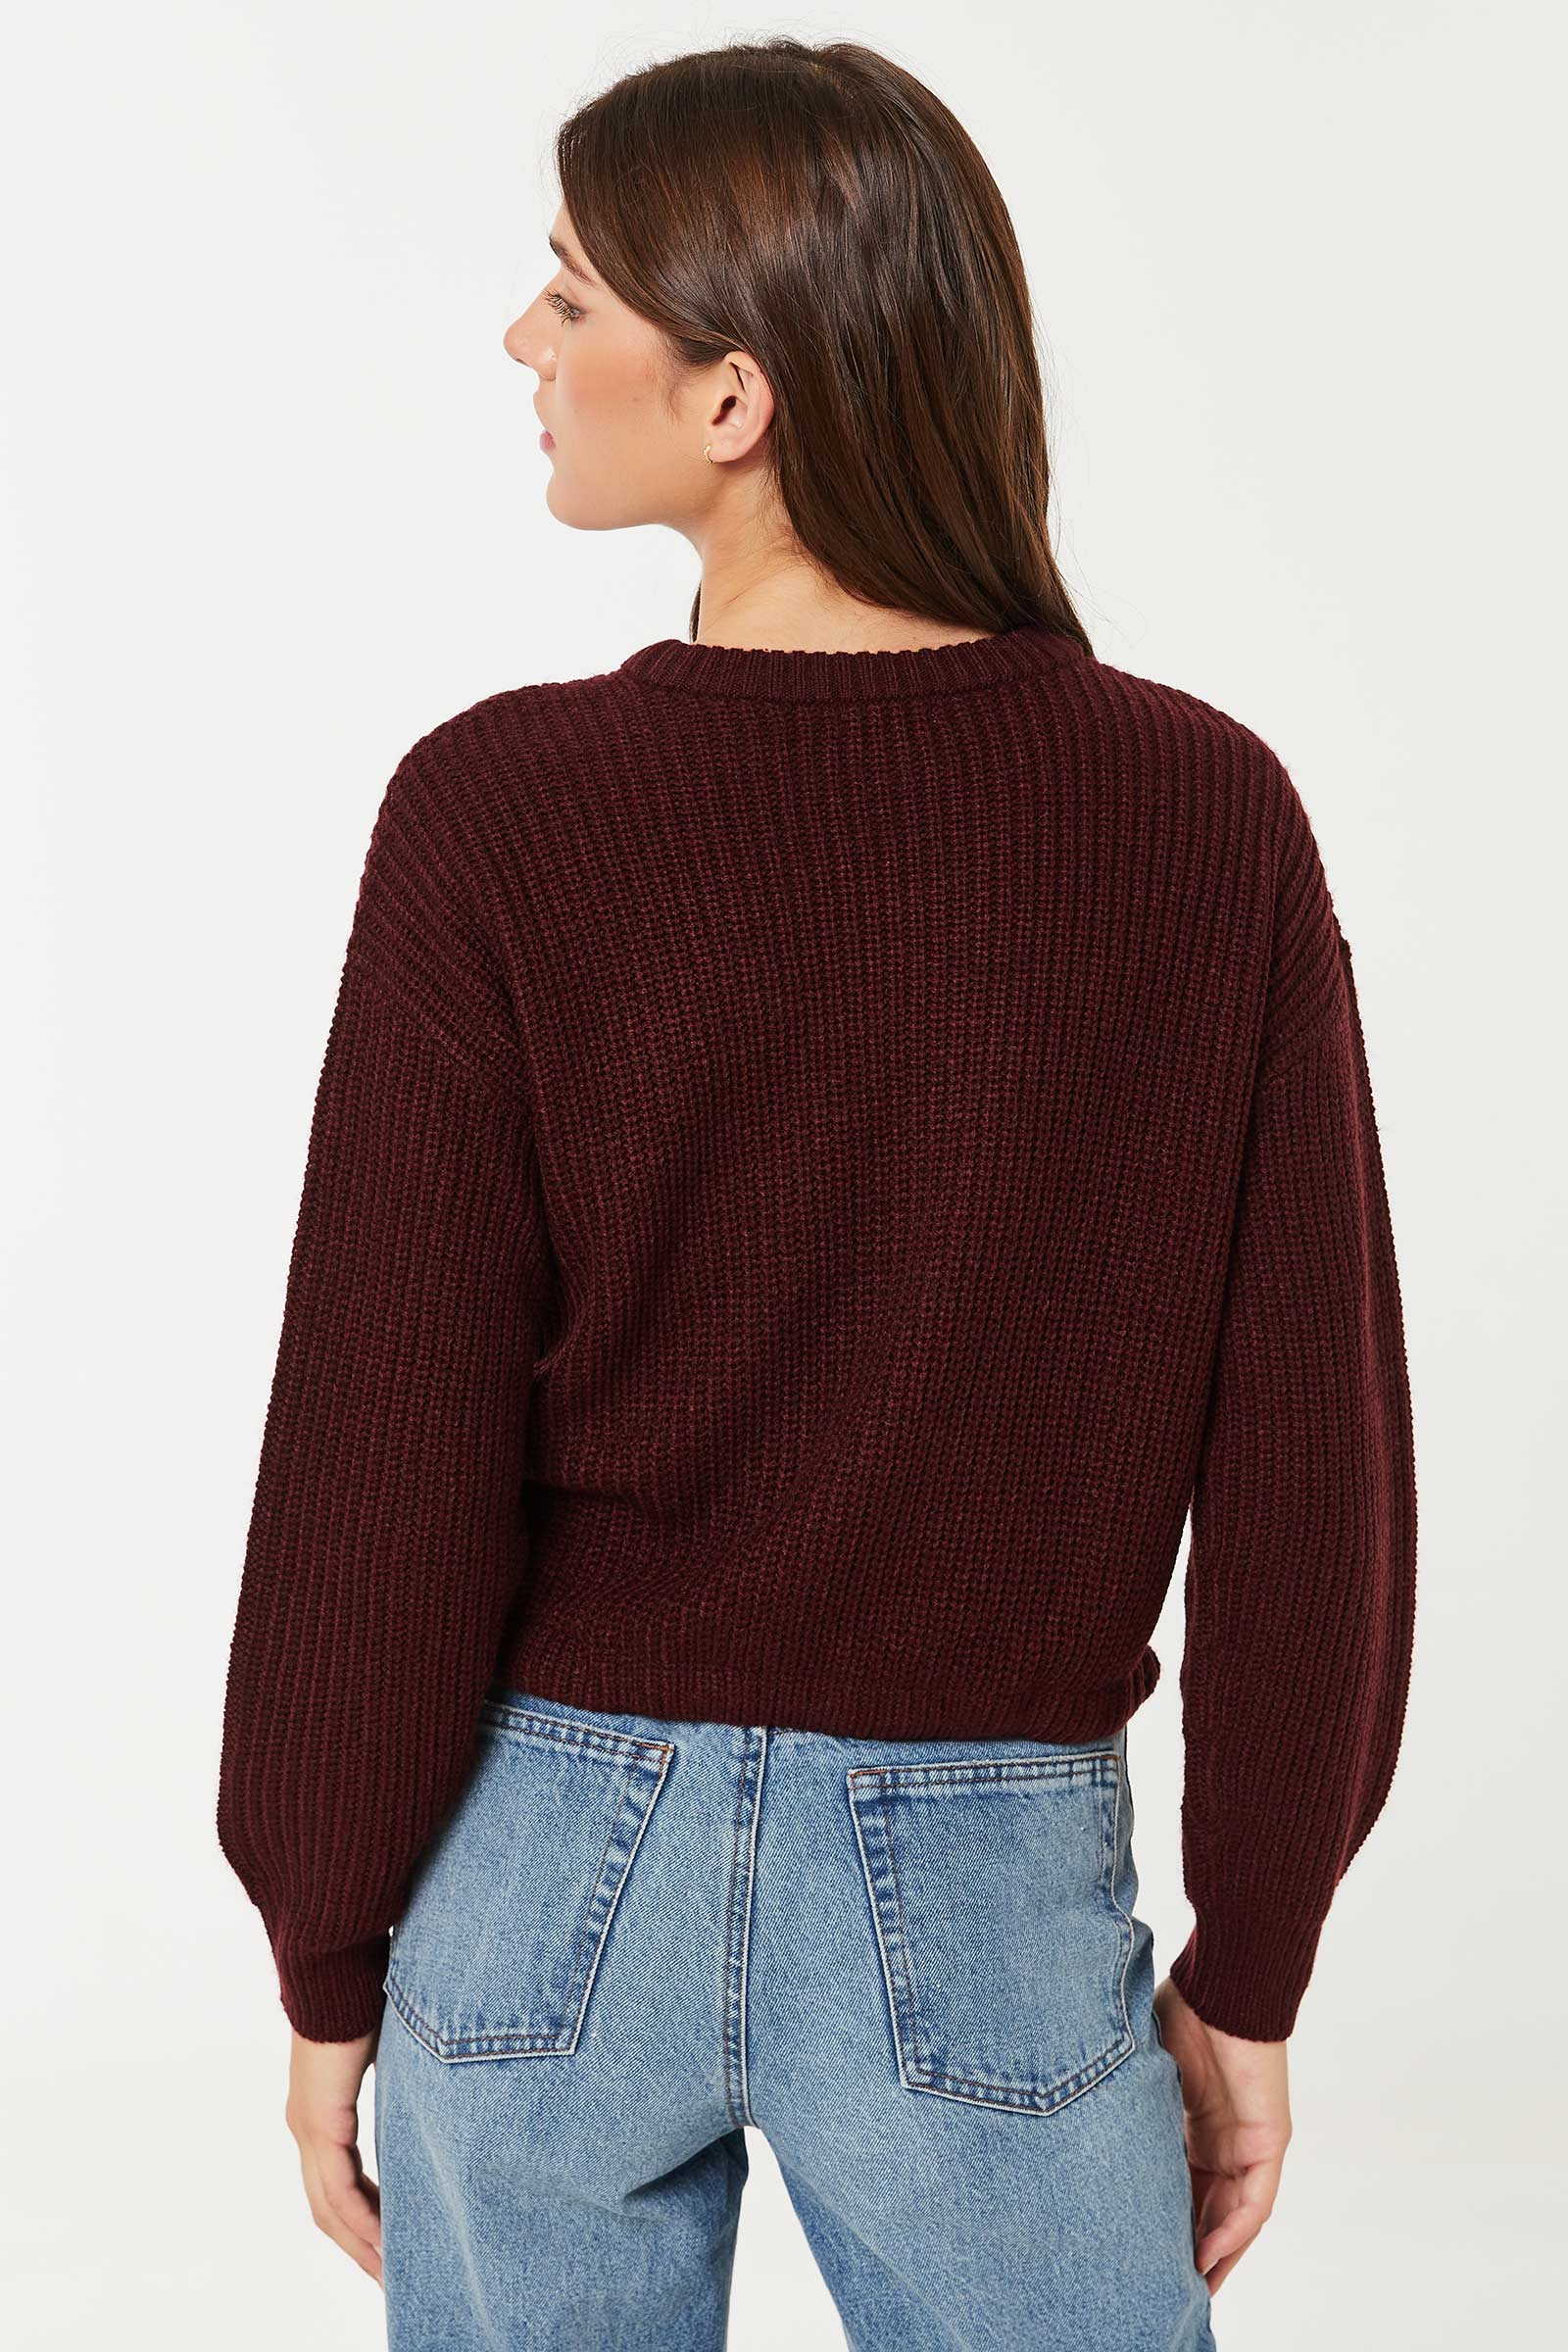 Crew Neck Sweater with drawstring Hem